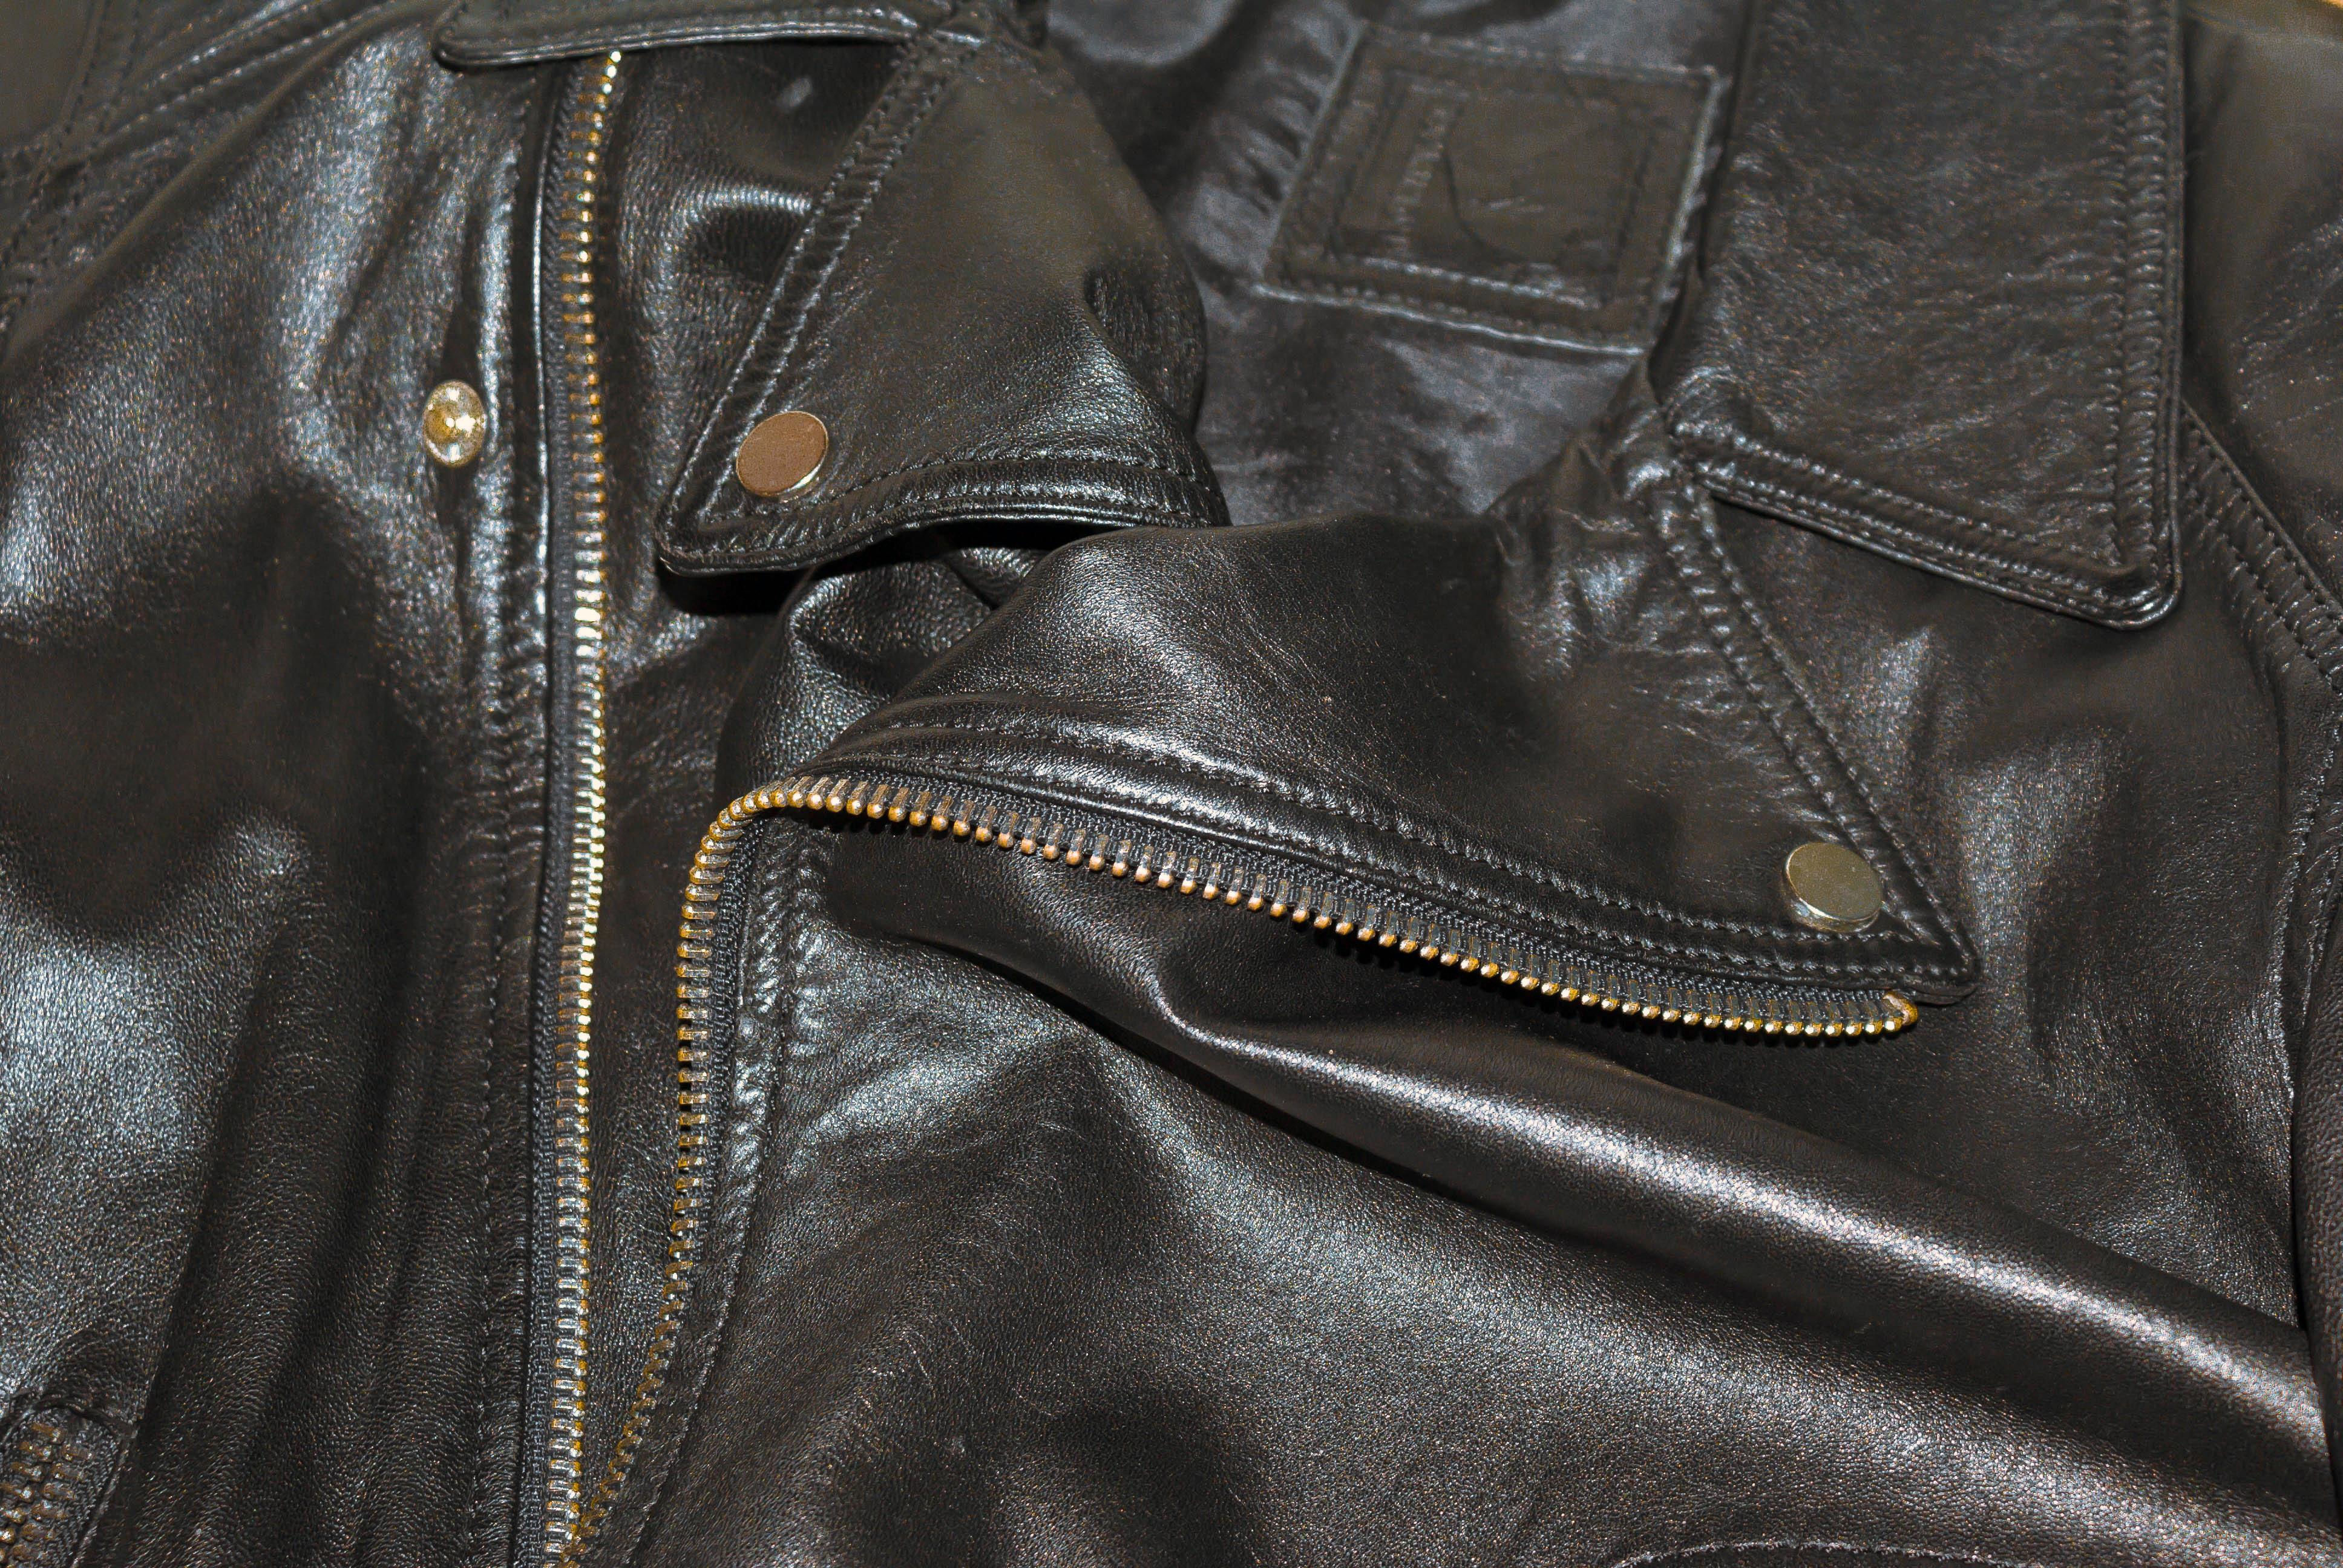 d7c462ba lær jakke tekstur svart skinnjakke brun tekstil glidelås materiale lomme  metall produkt